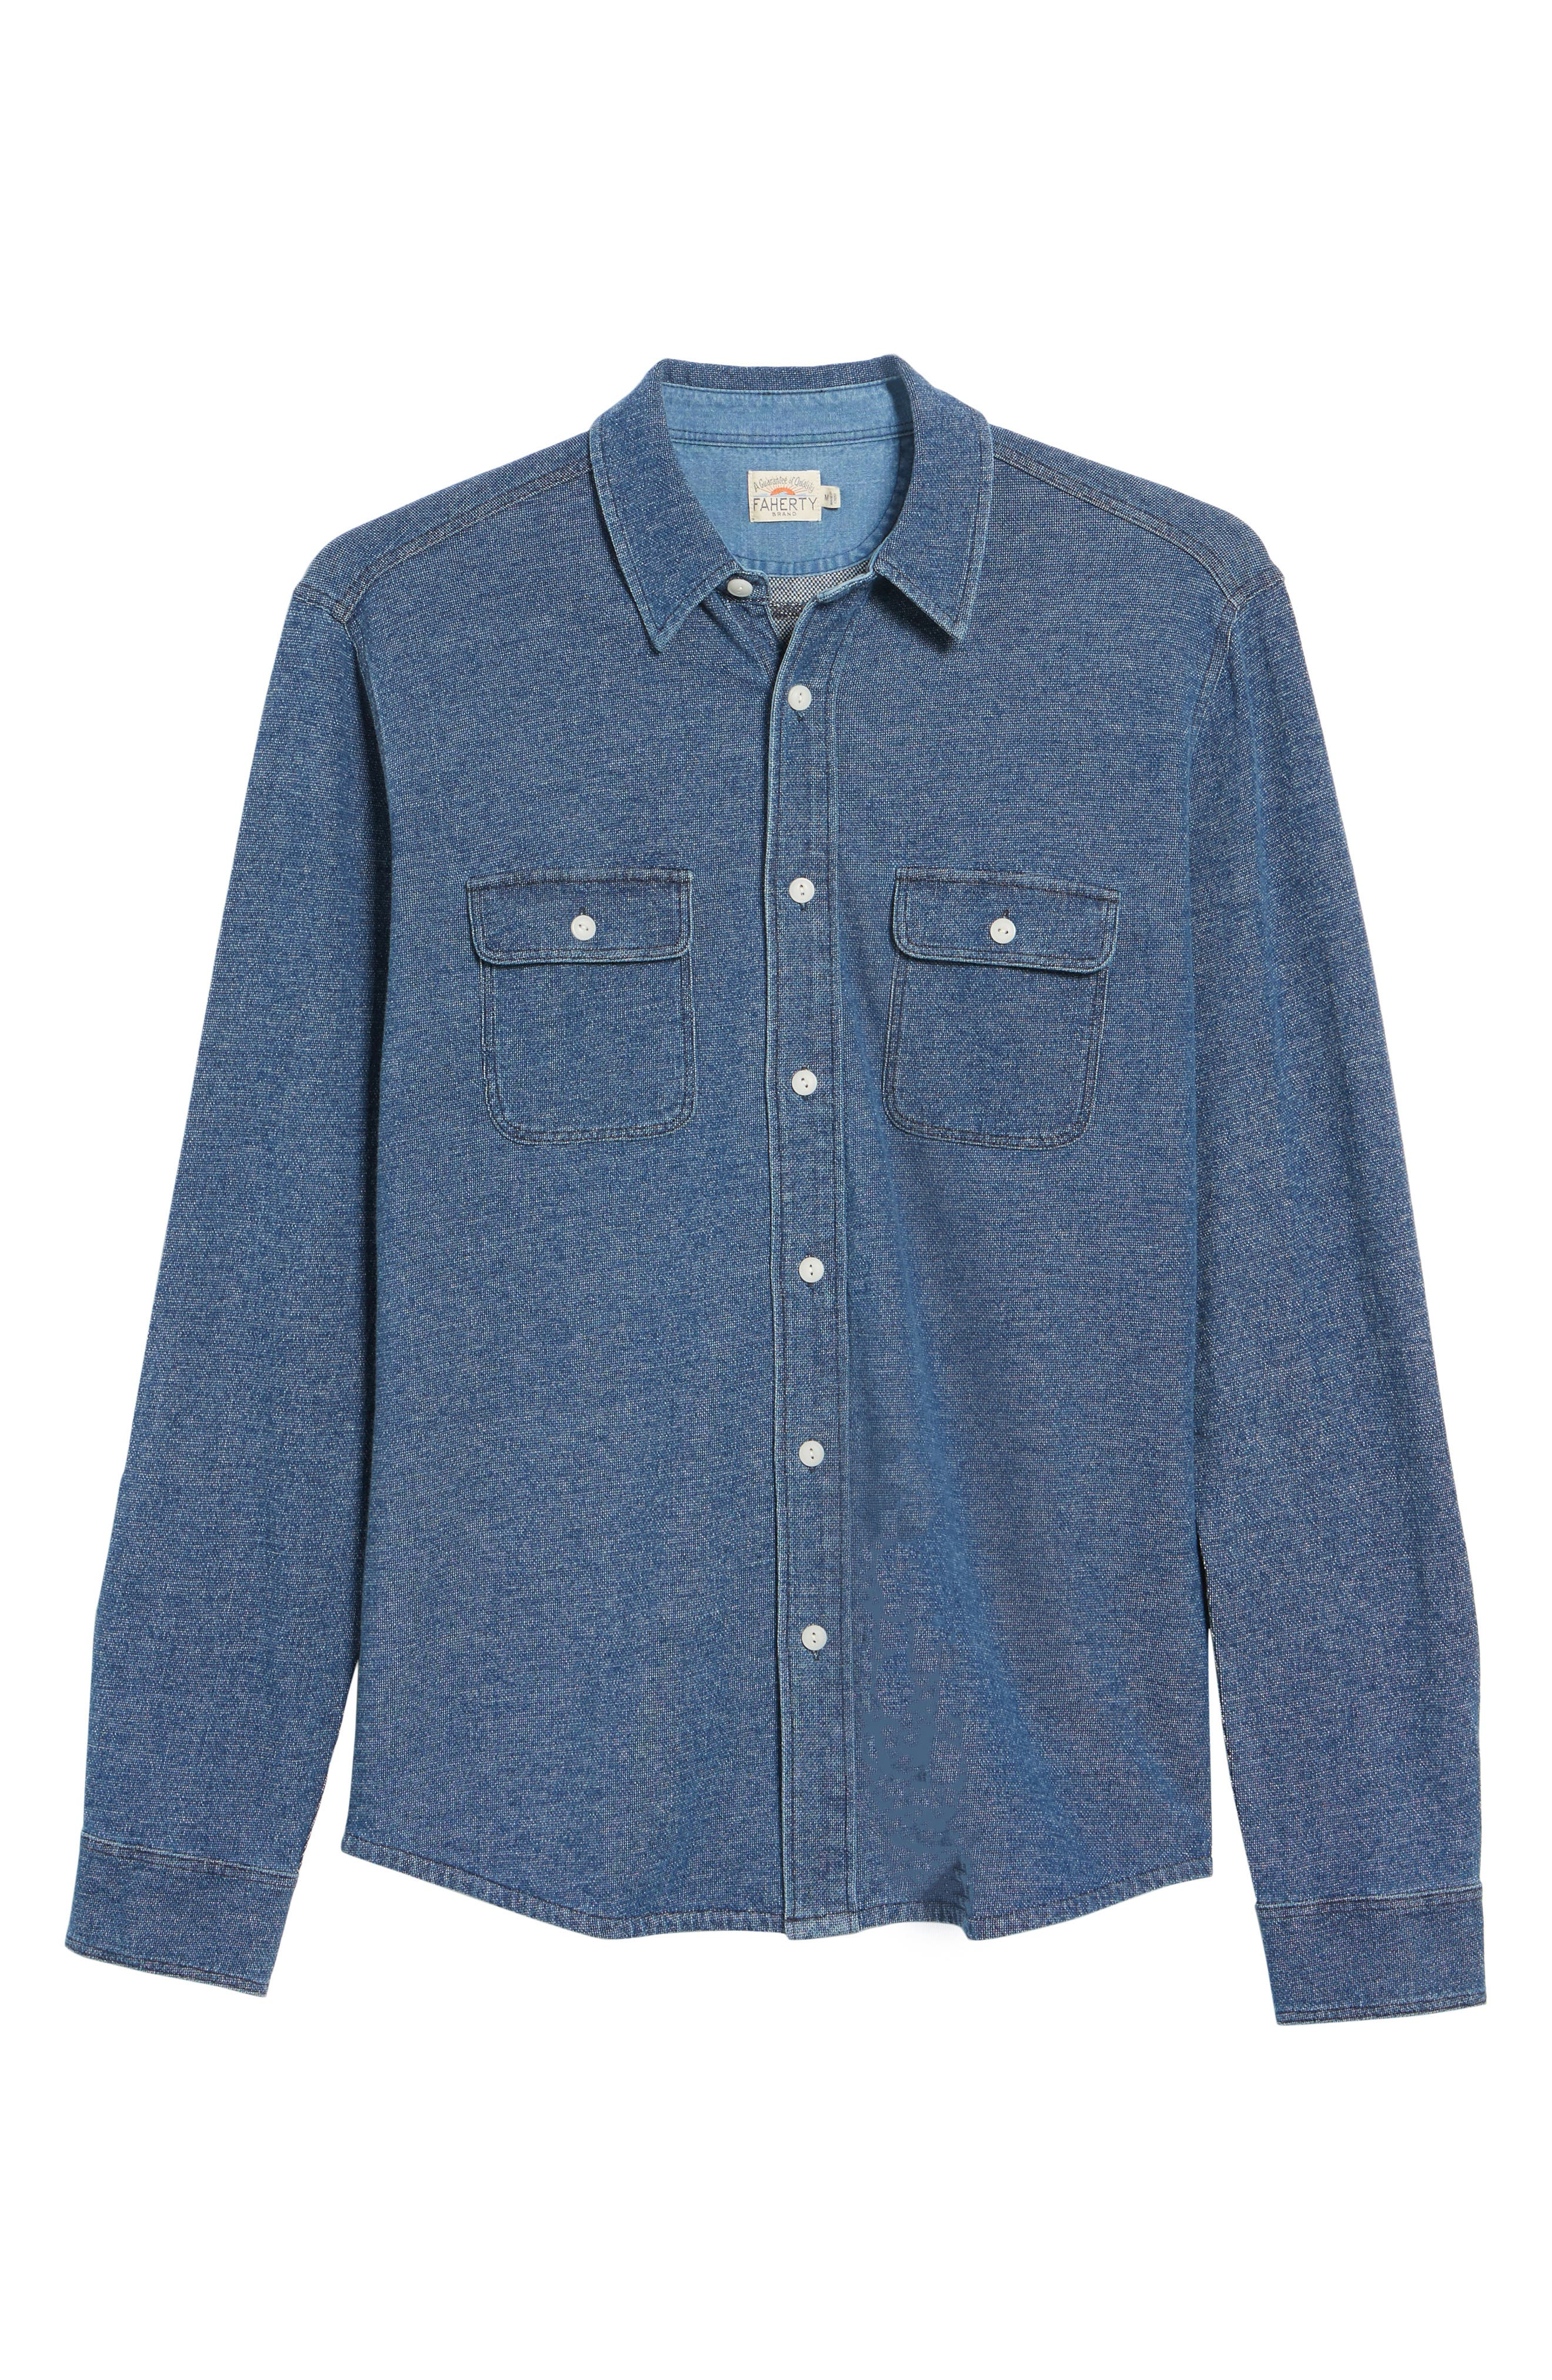 Belmar Chambray Knit Sport Shirt,                             Alternate thumbnail 6, color,                             420